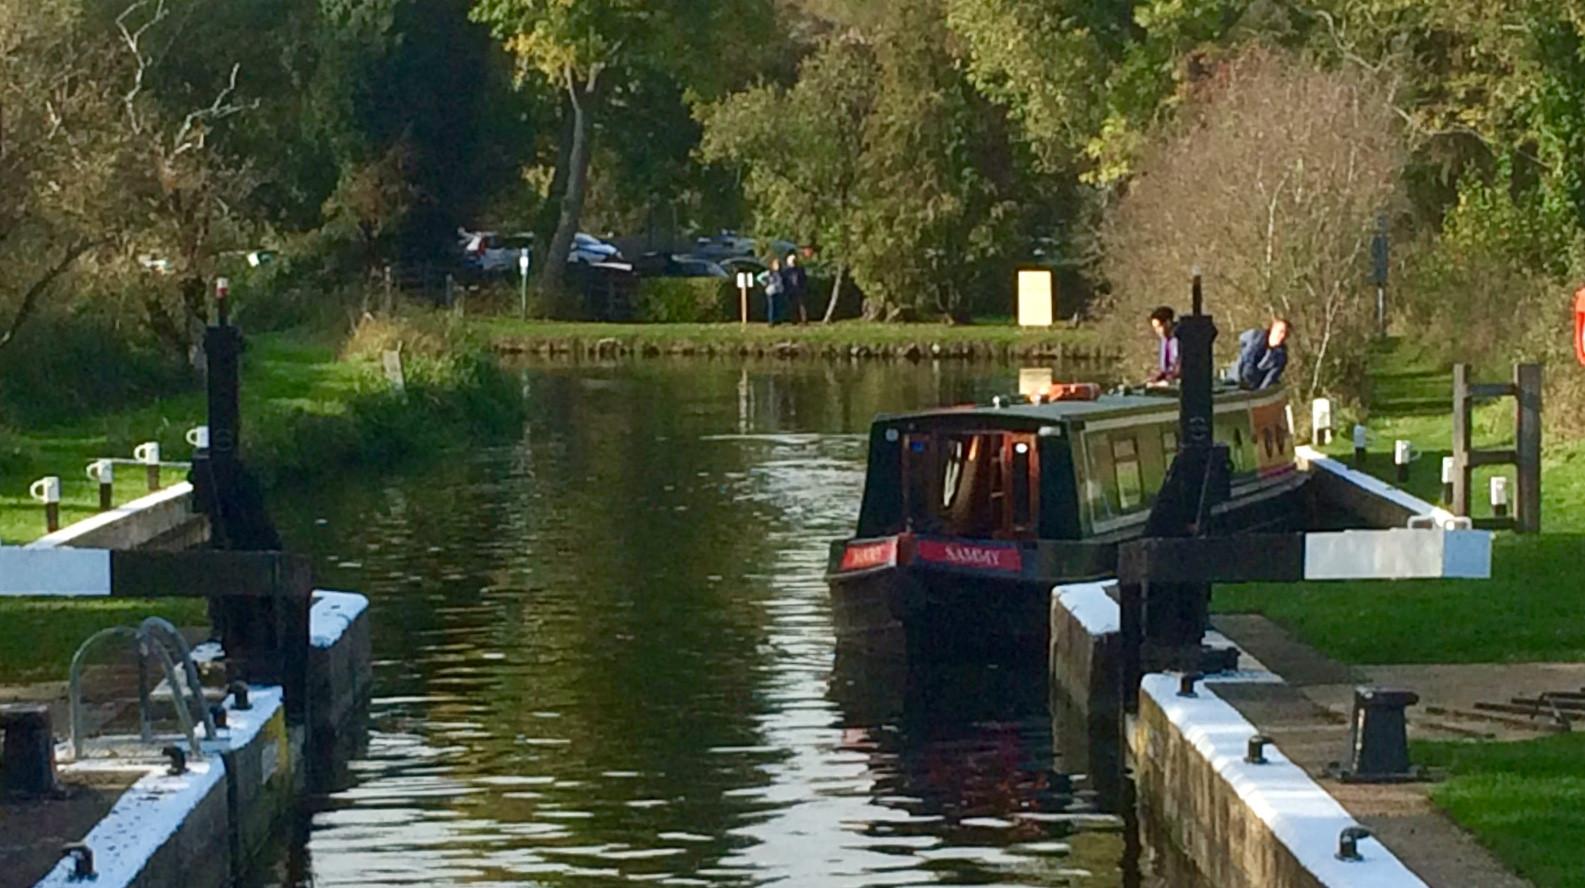 At Upper Barnwell Lock